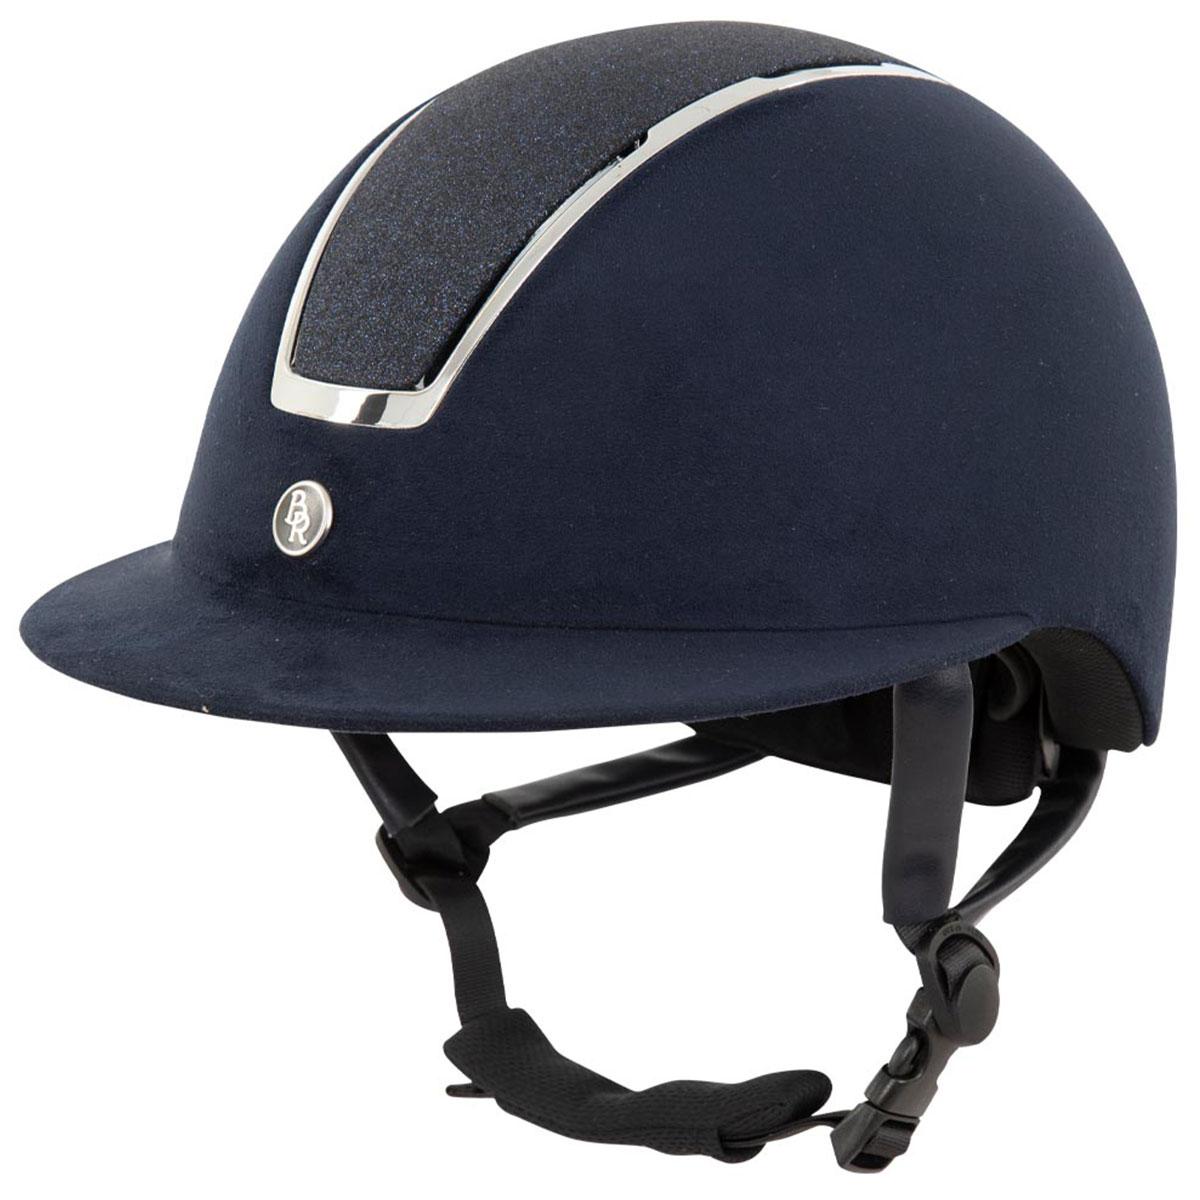 BR Omega Glitter cap donkerblauw maat:52-55 - Veiligheid